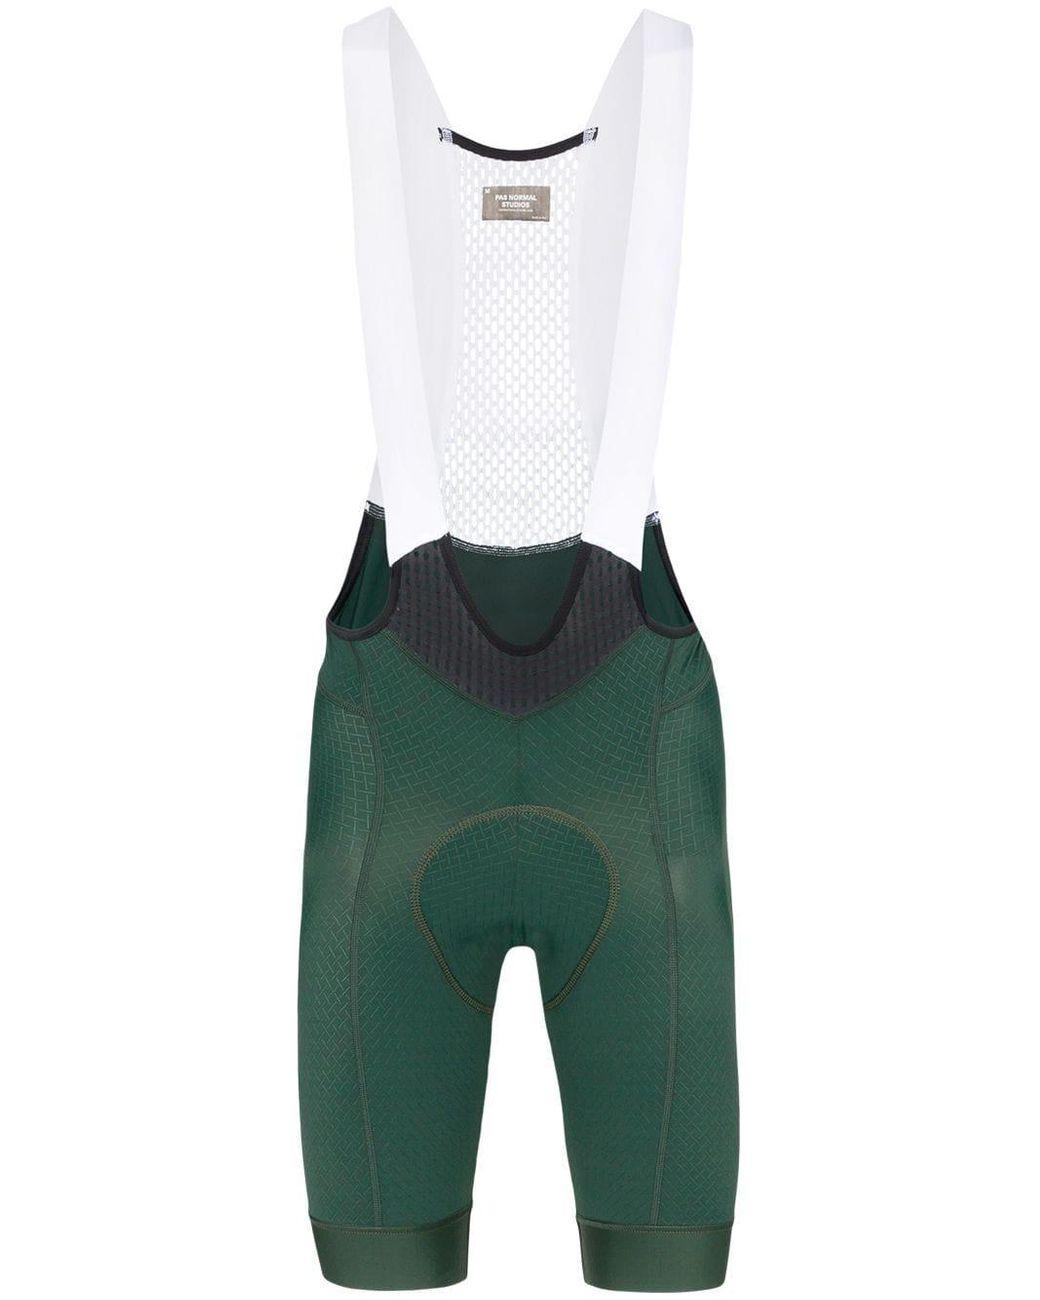 Viking Heritage Short Sleeve Full Zip Cycling Jersey White Black with bib Shorts